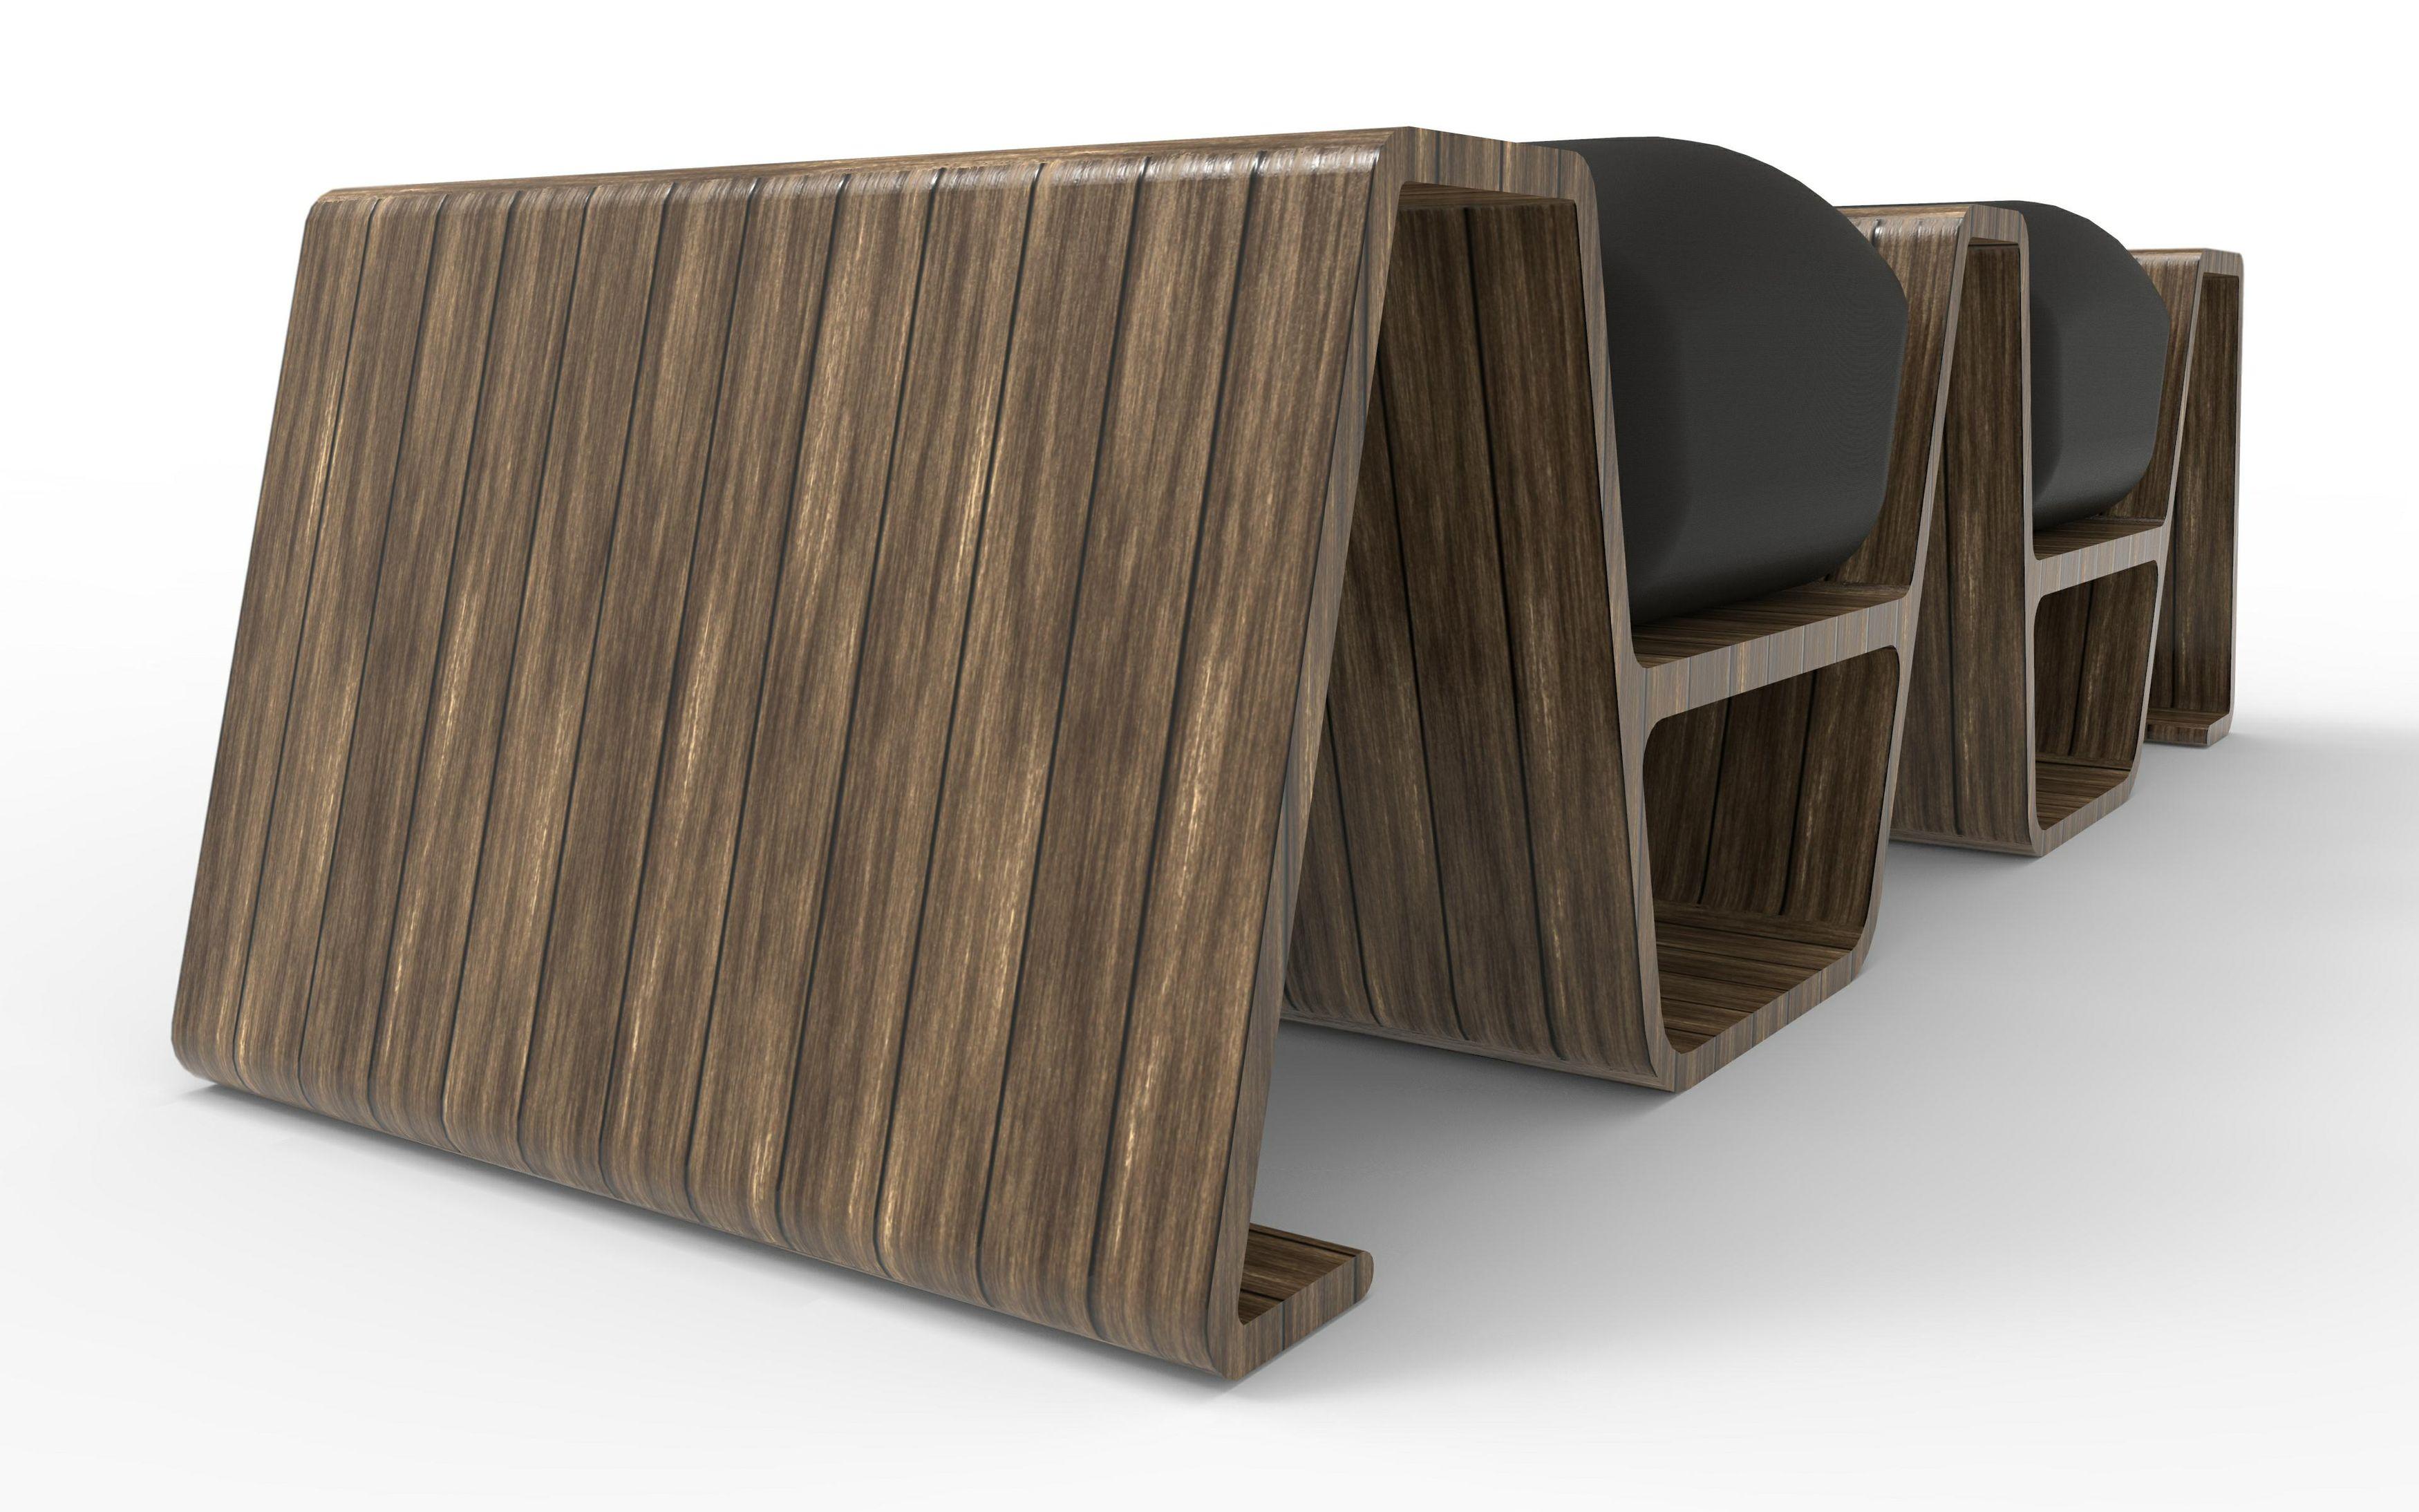 Design-fabrica-de-nerdes-slimit-final-design2-3500-3500